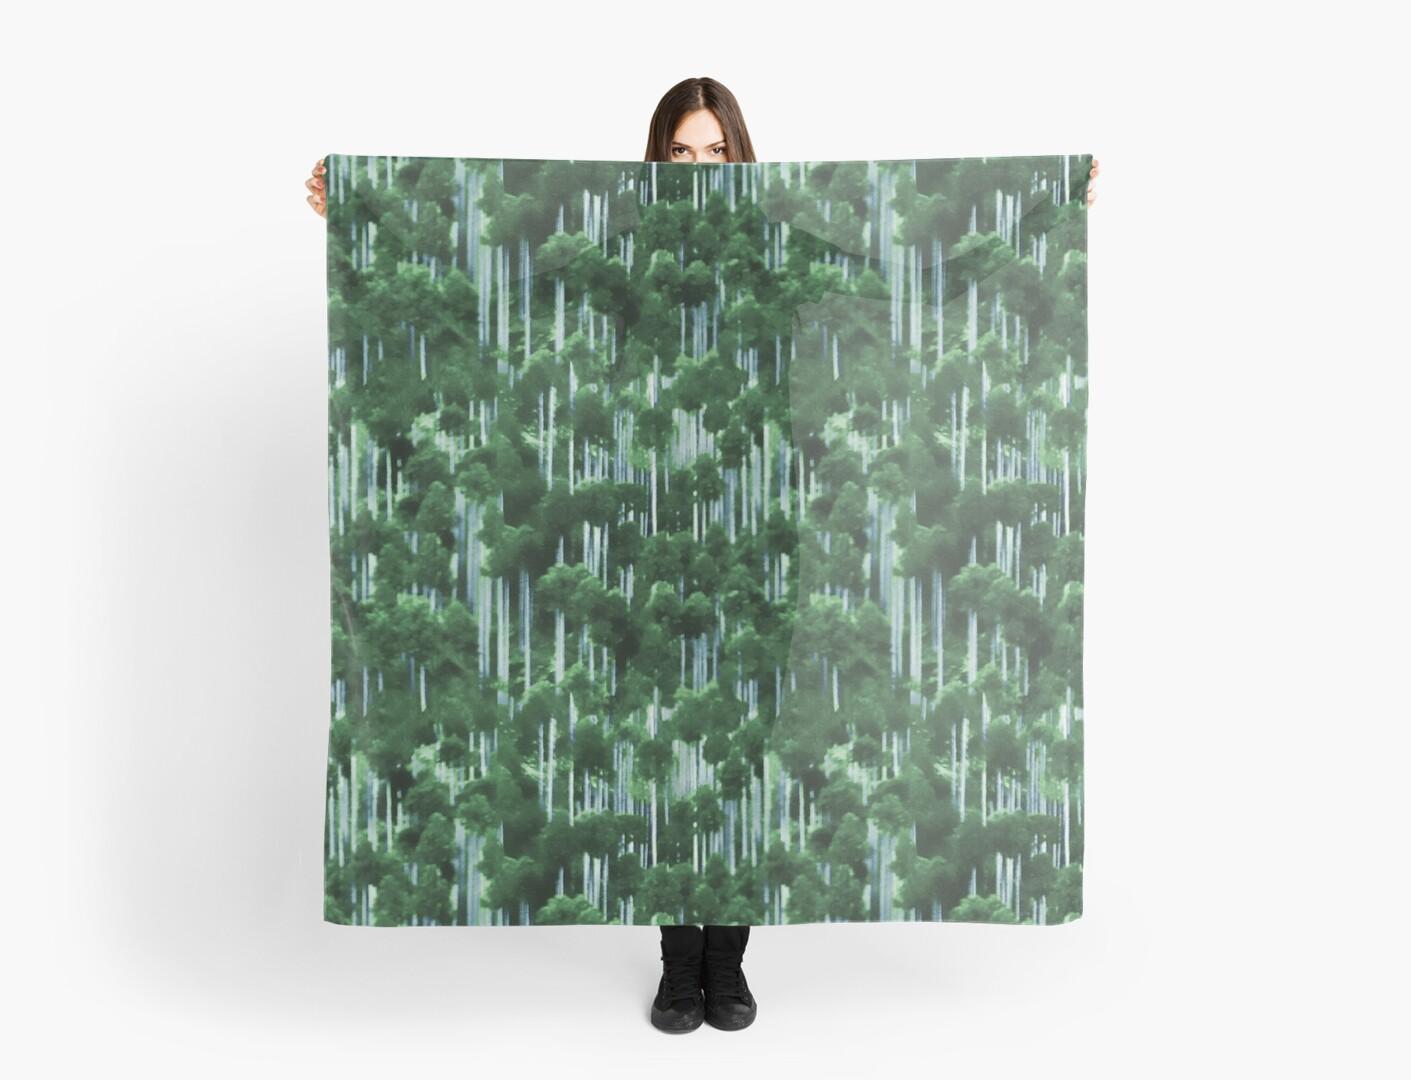 Japanese cedar forest pattern by Ivy Izzard